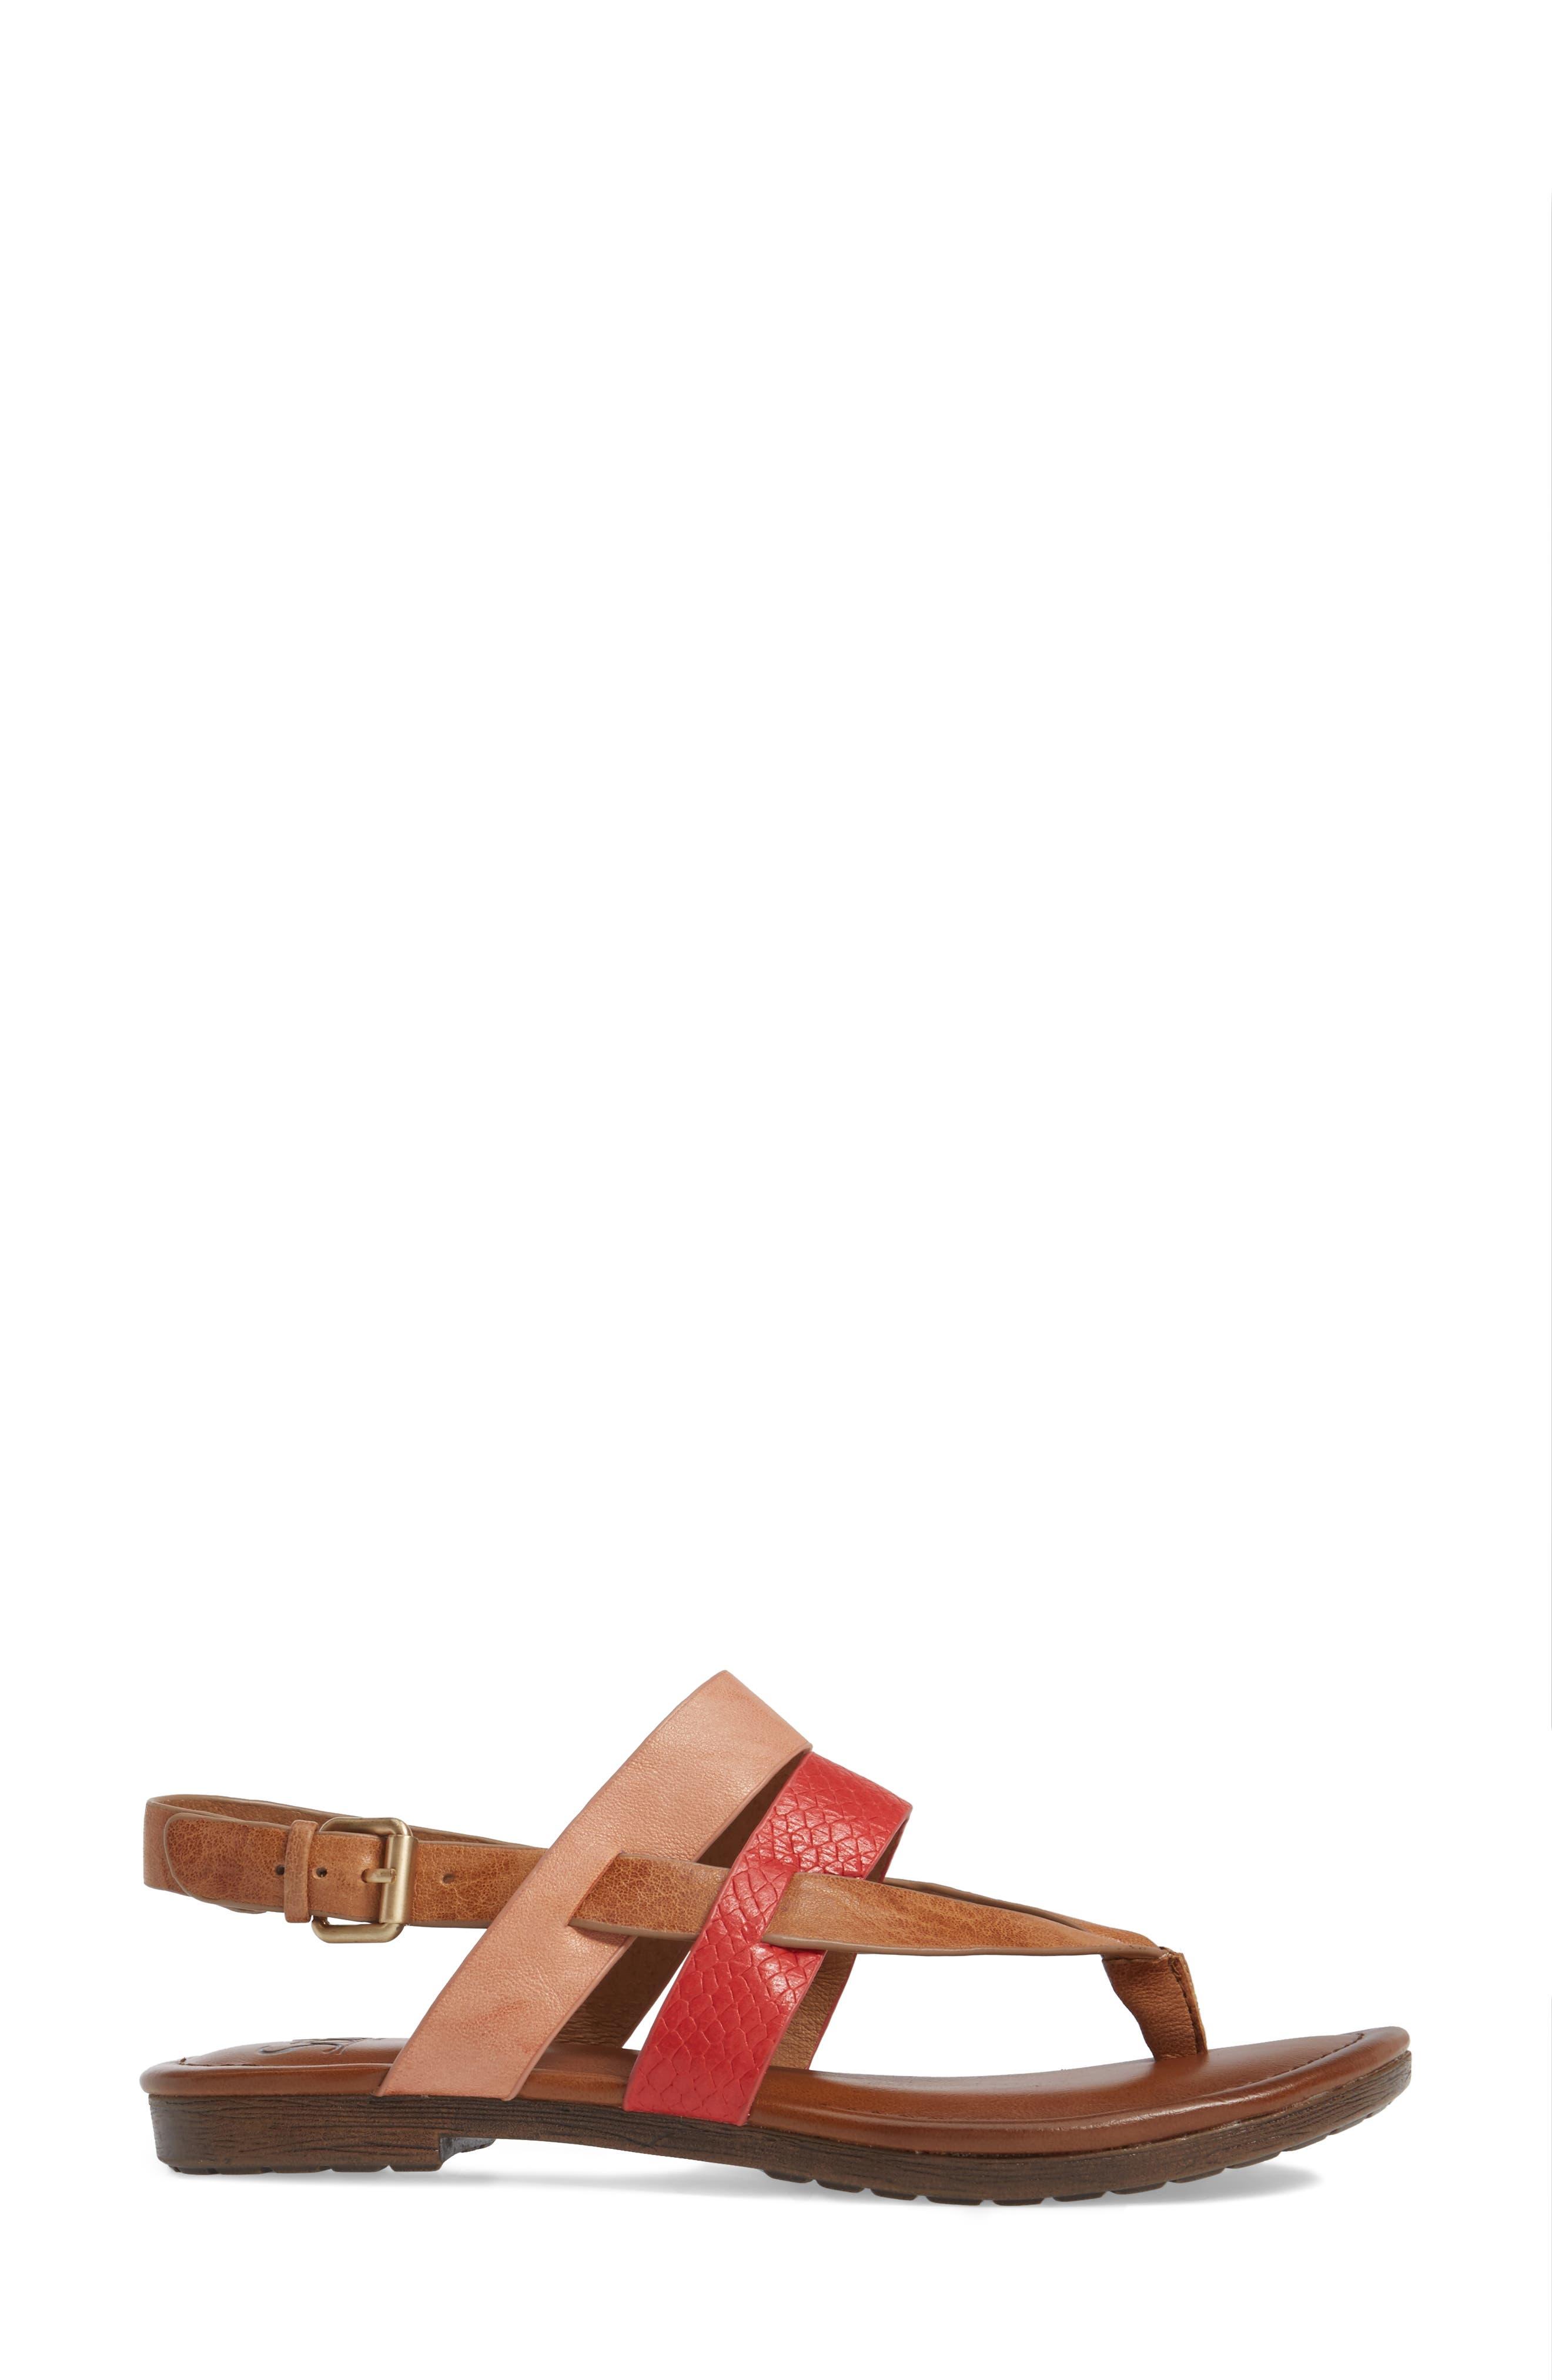 Bena Strappy Sandal,                             Alternate thumbnail 8, color,